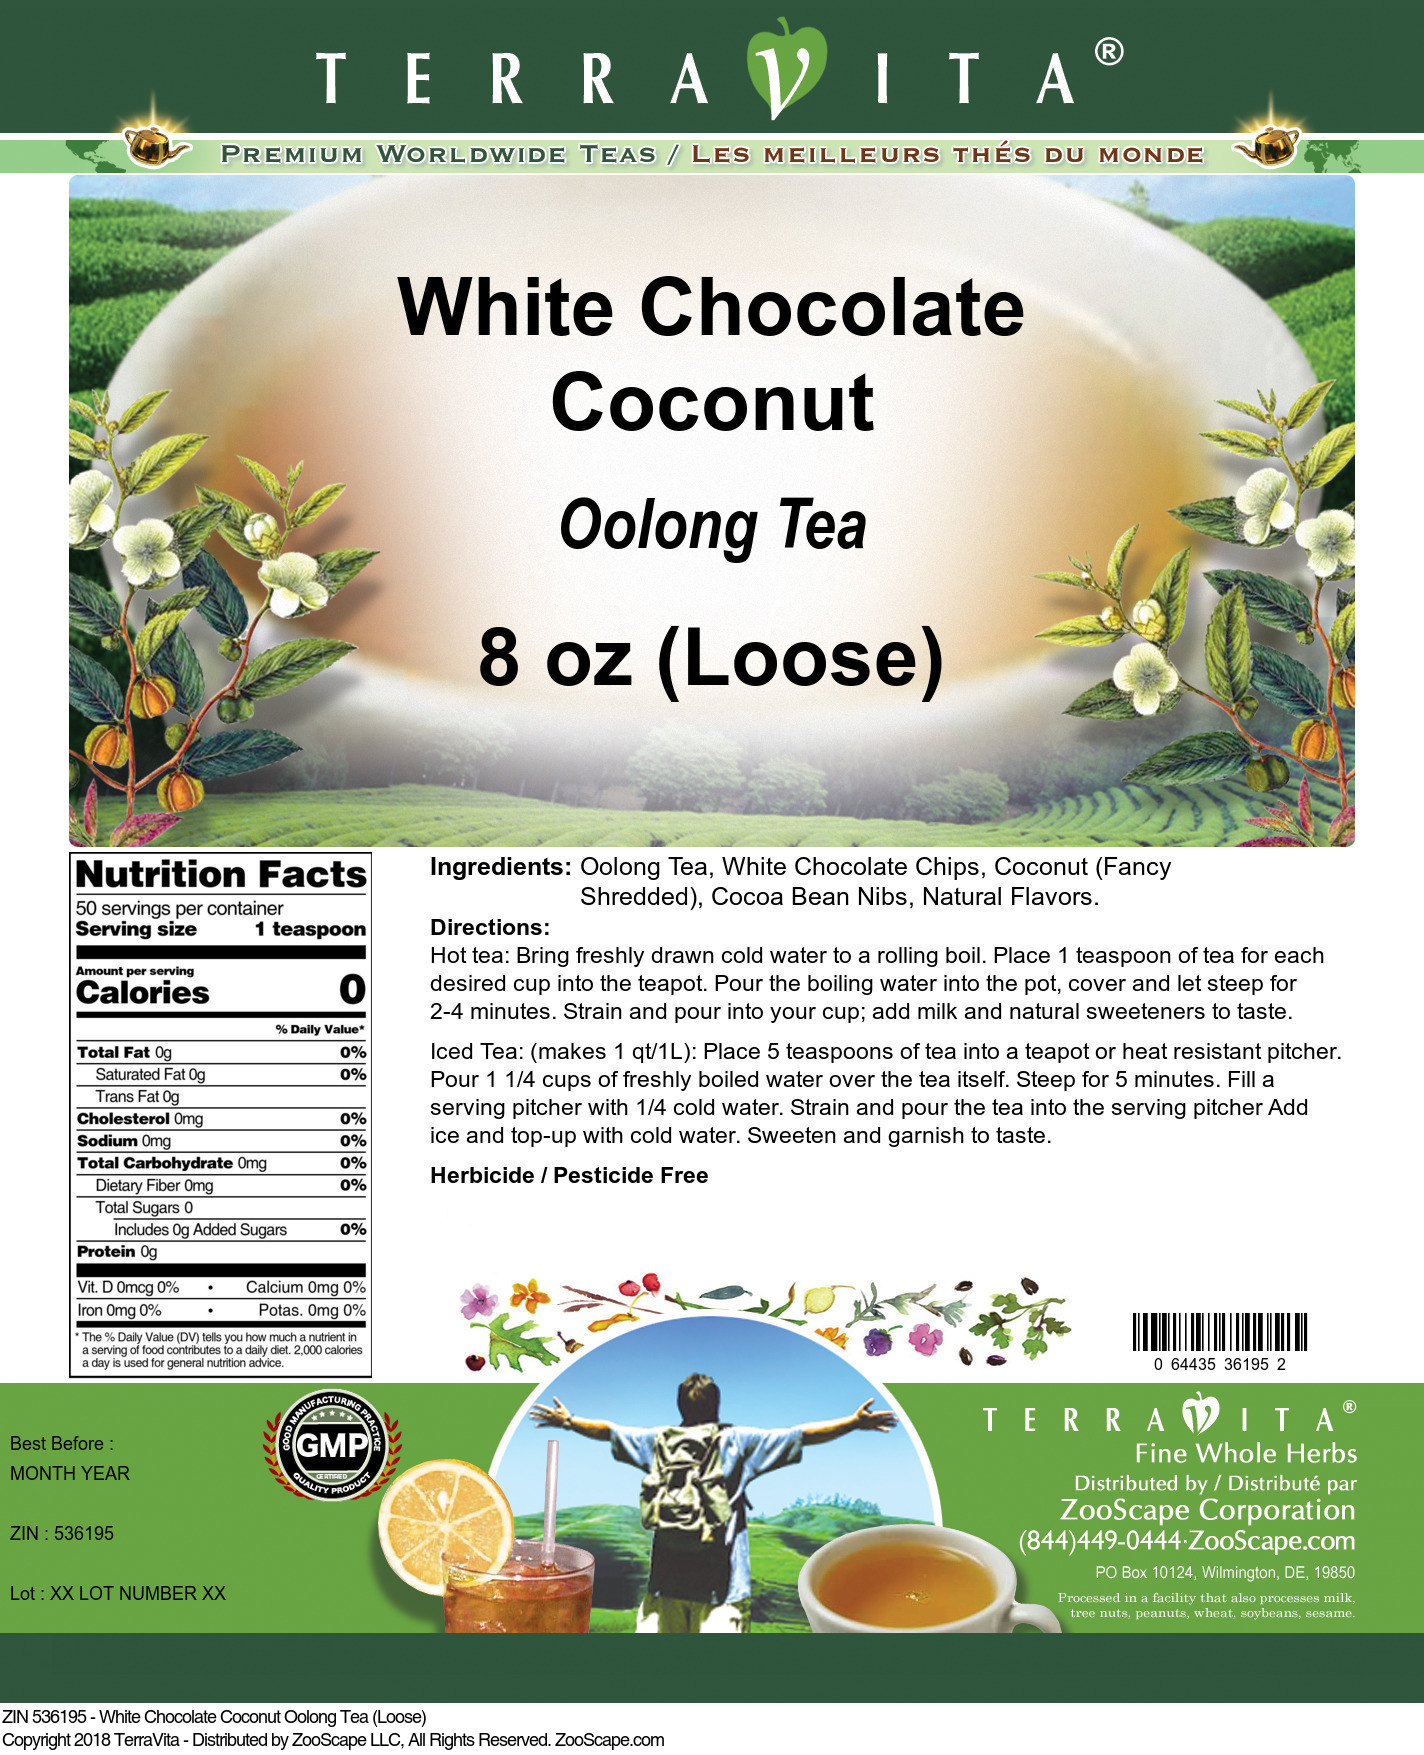 White Chocolate Coconut Oolong Tea